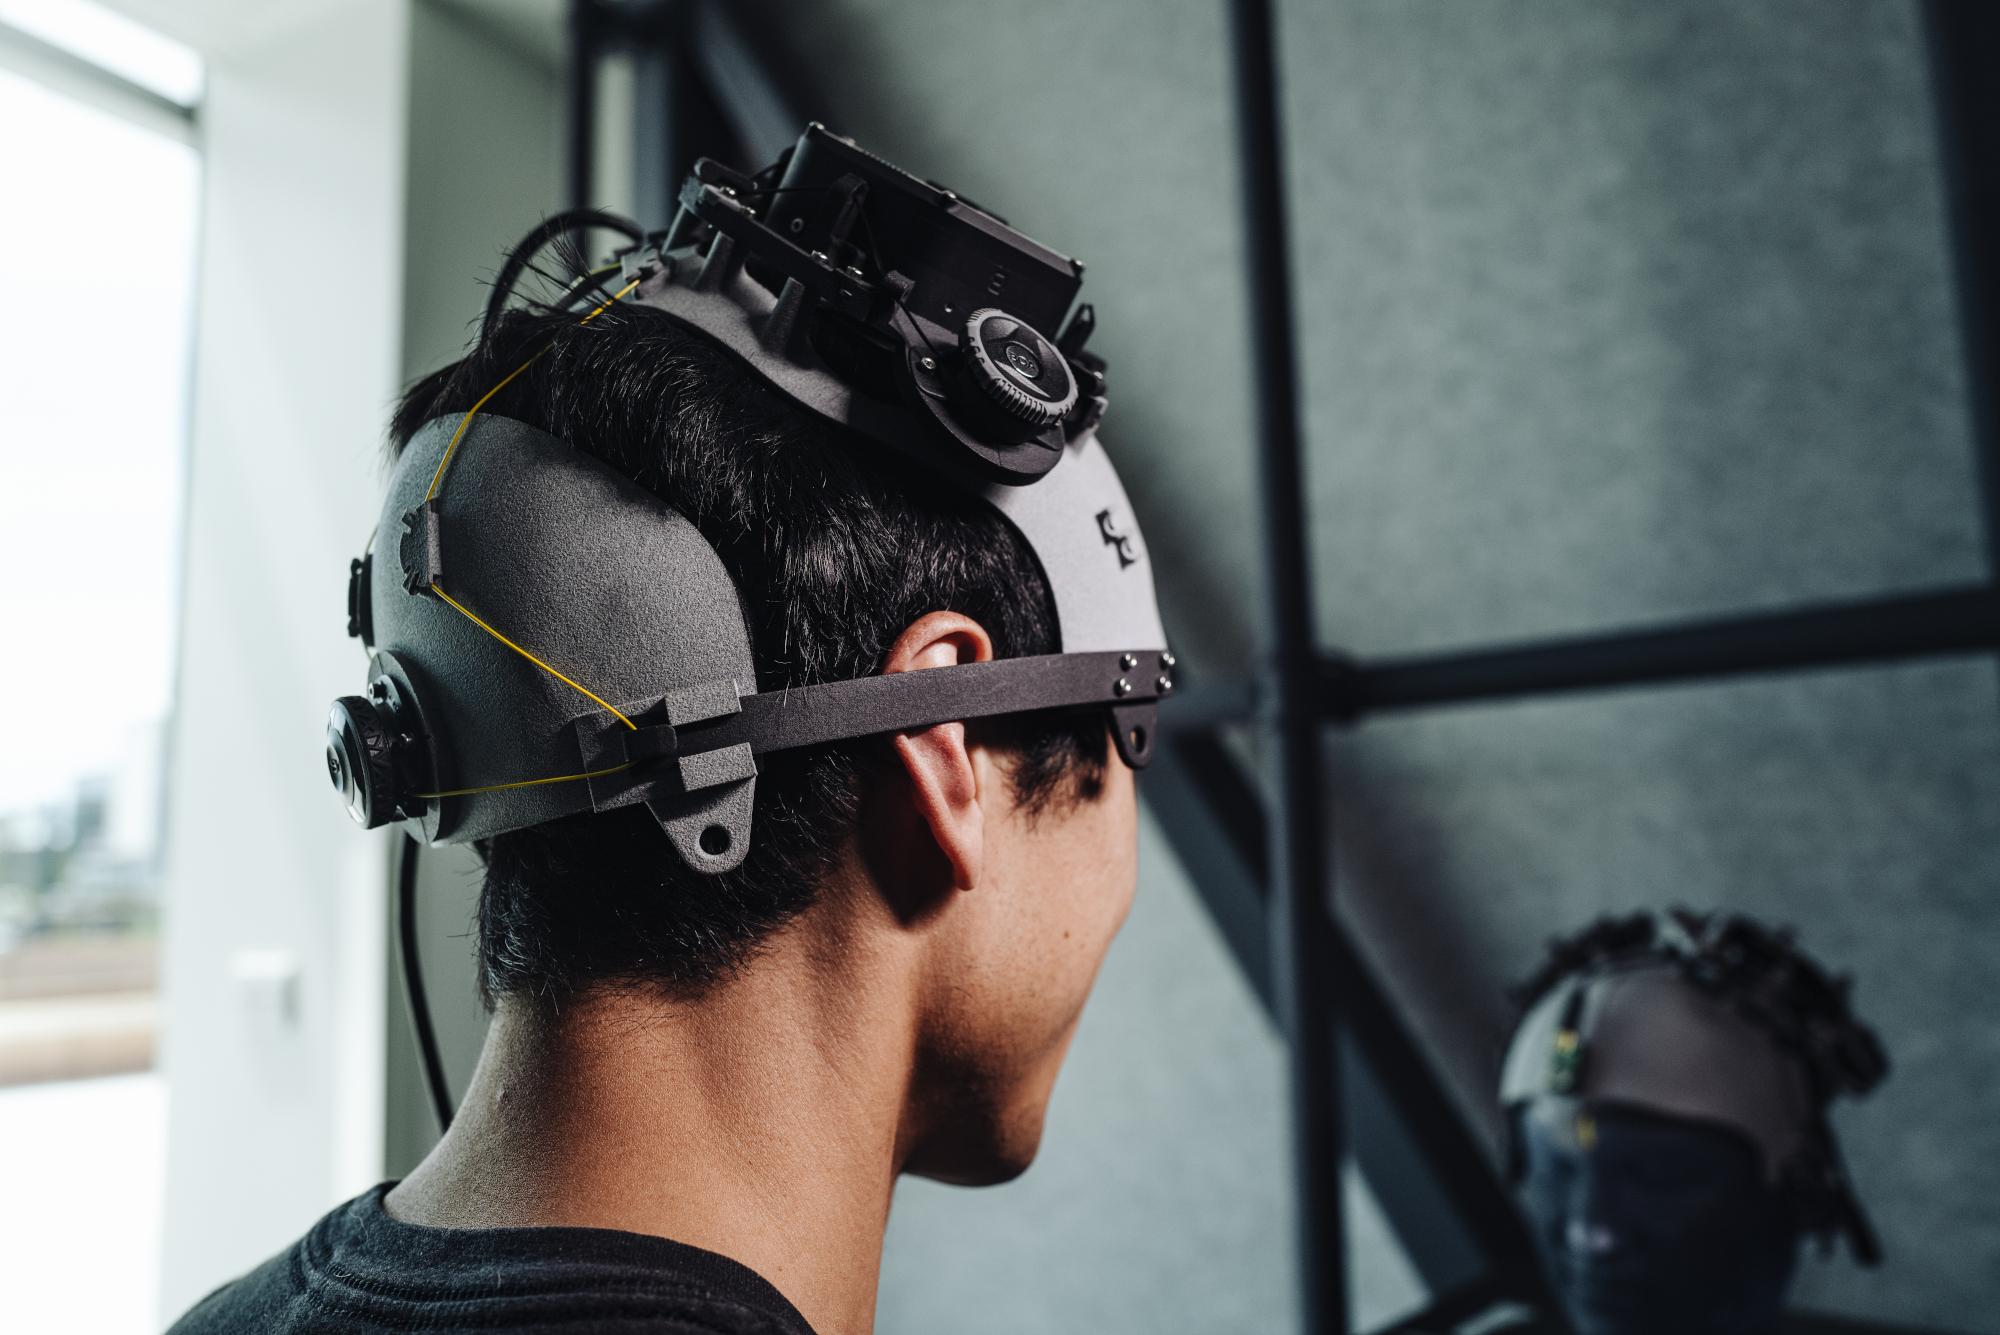 Facebook's prototype brain-computer interface headset.